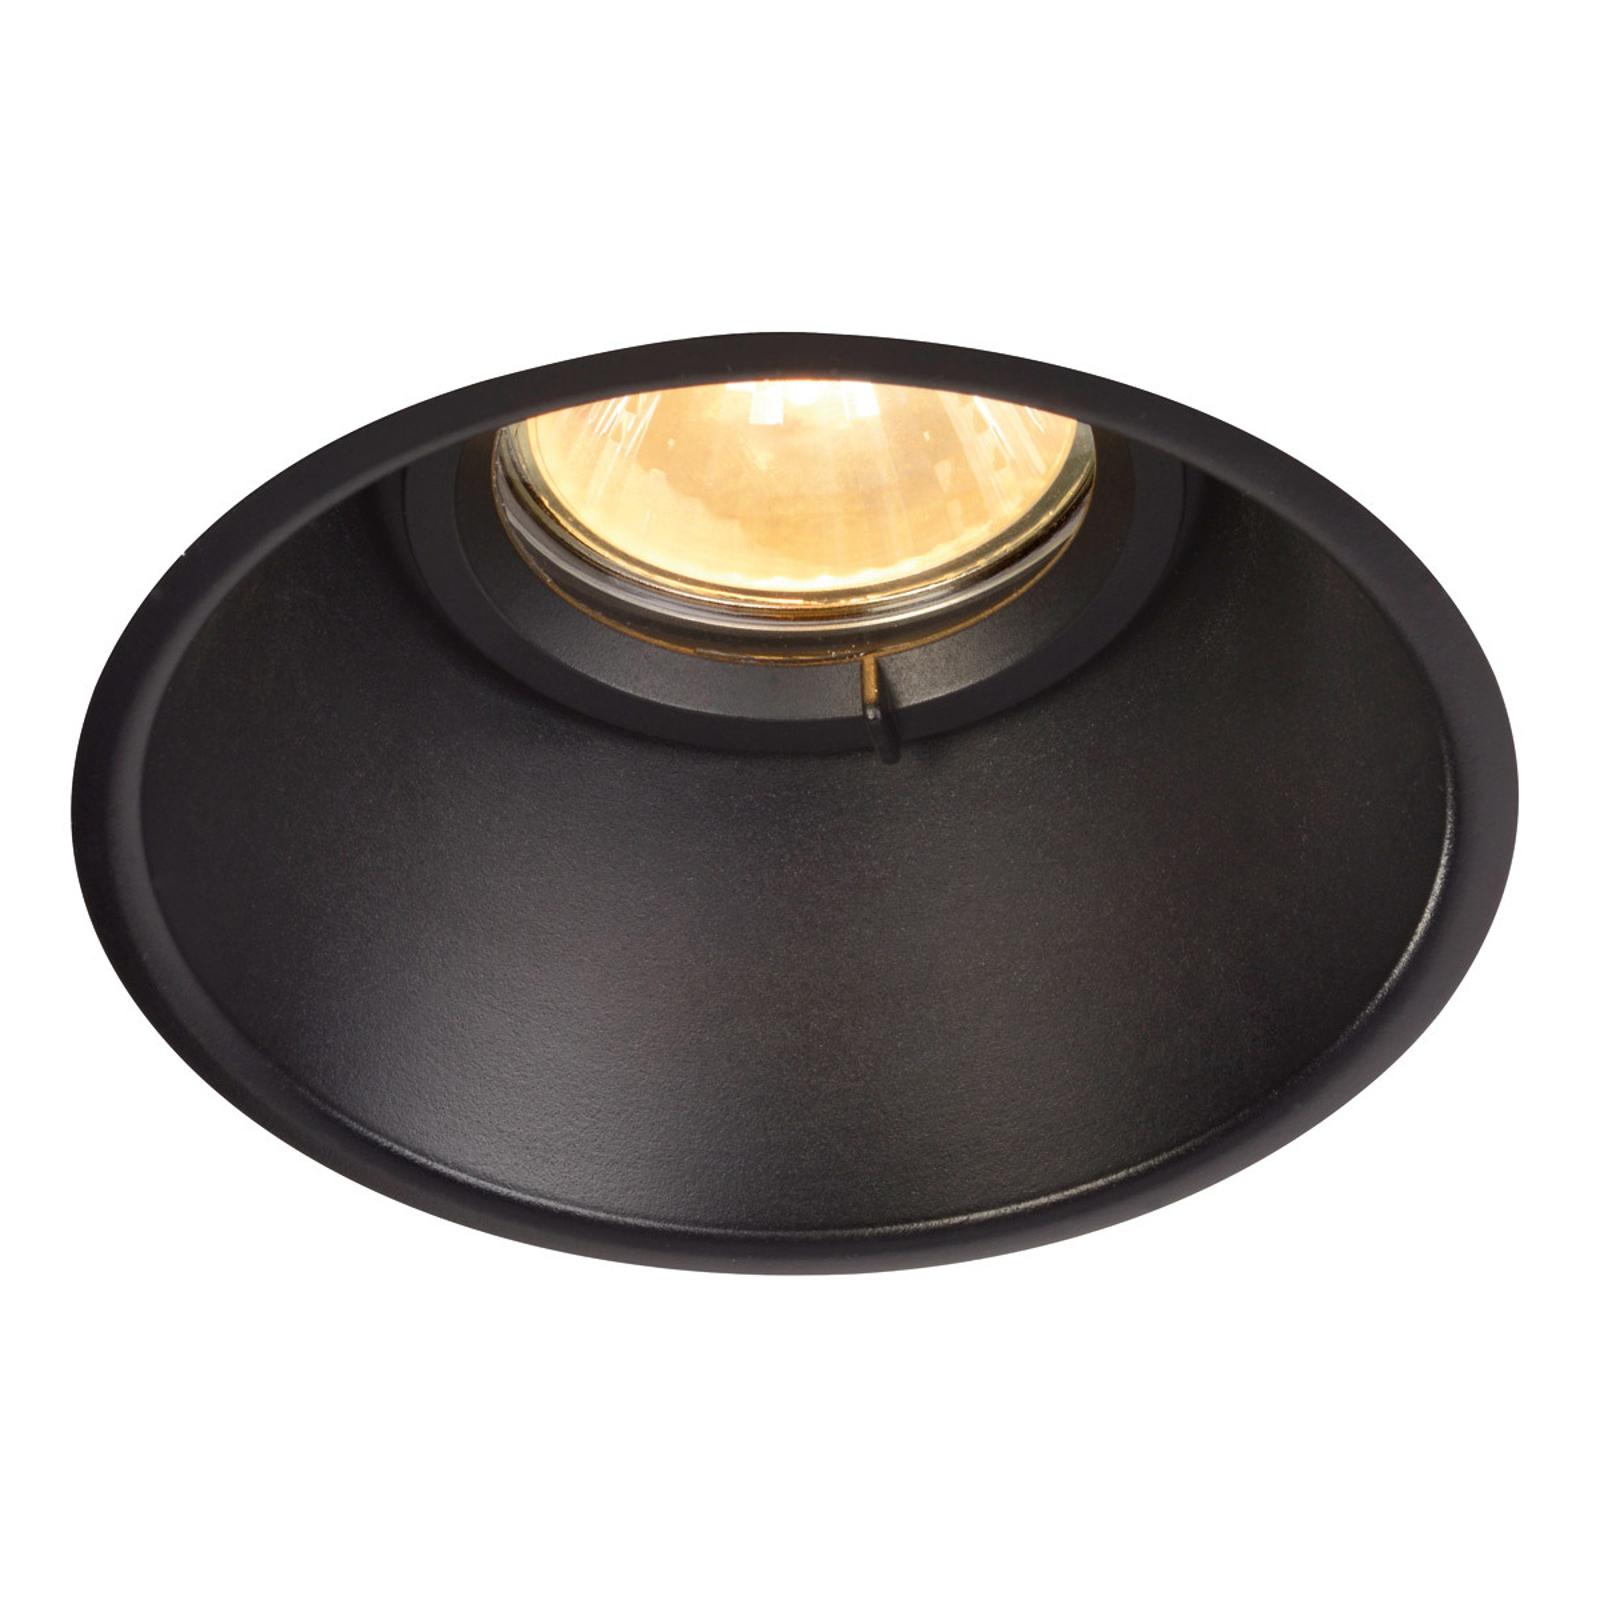 Inconspicuous Horn-O ceiling spotlight, black_5504648_1